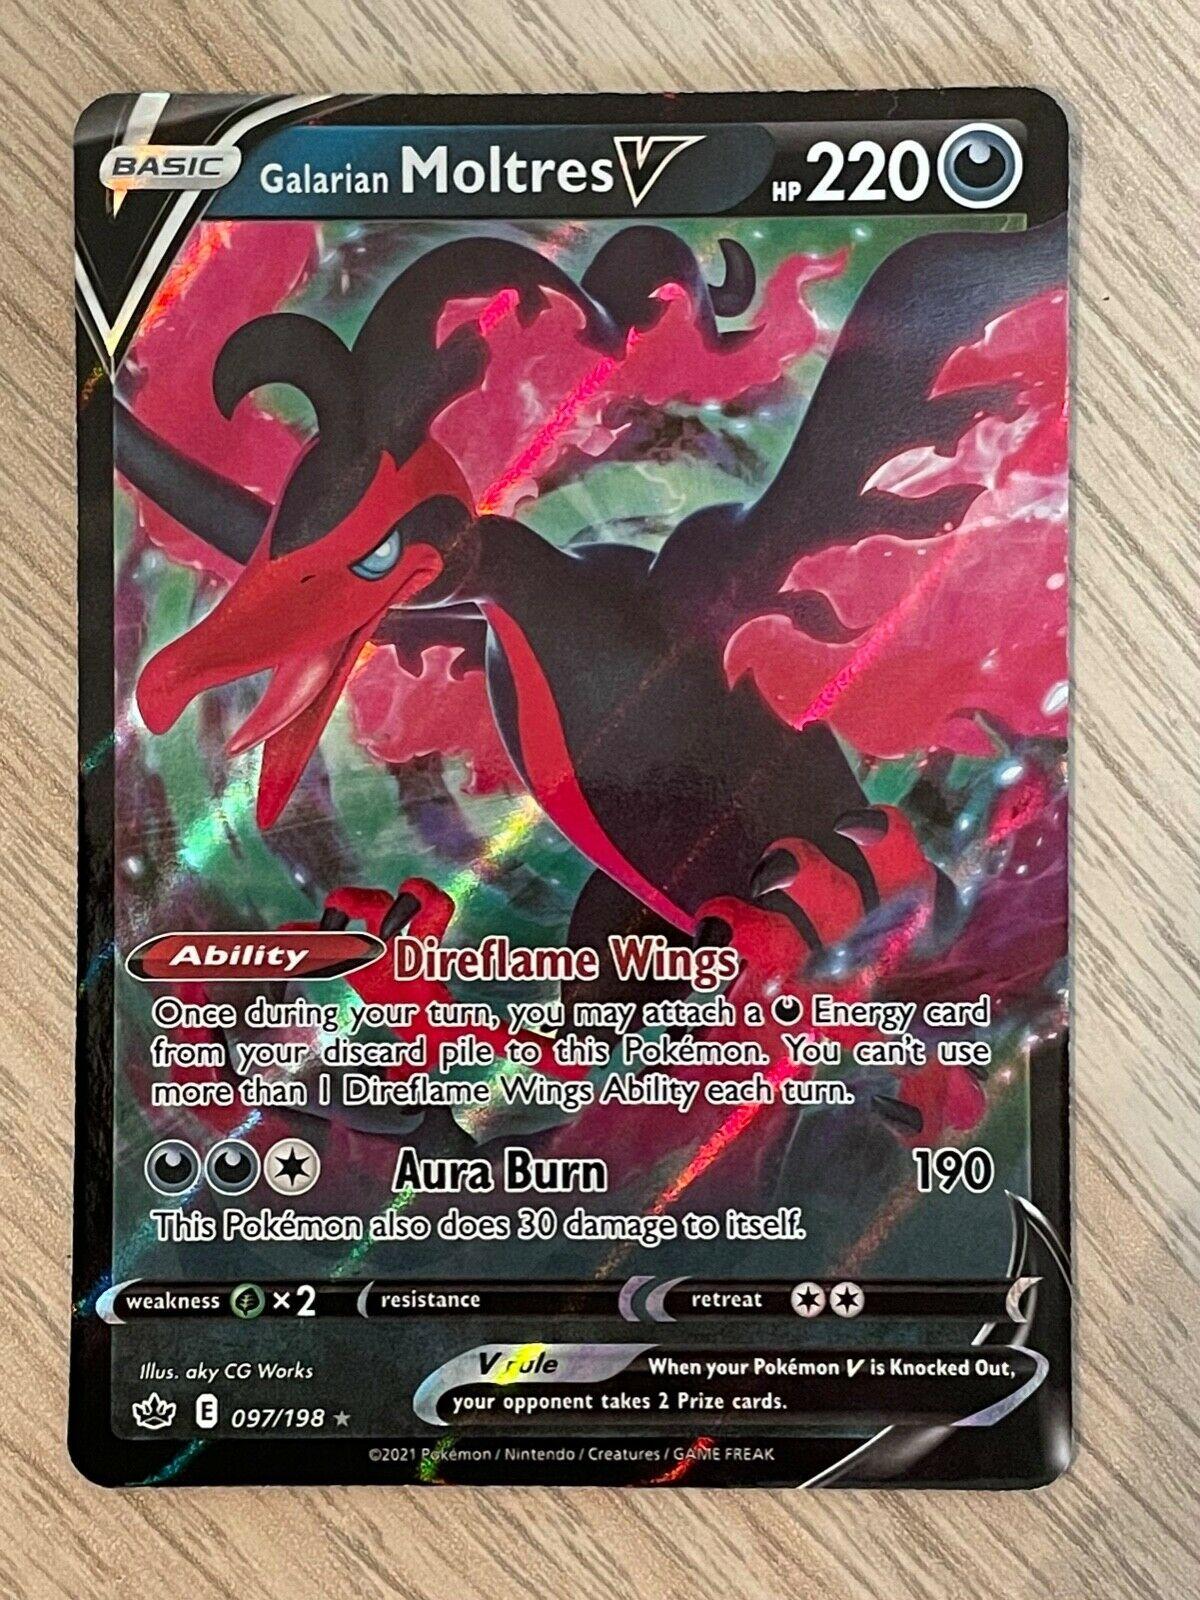 Galarian Moltres V 097/198 Chilling Reign Ultra Rare Pokemon Card - NM